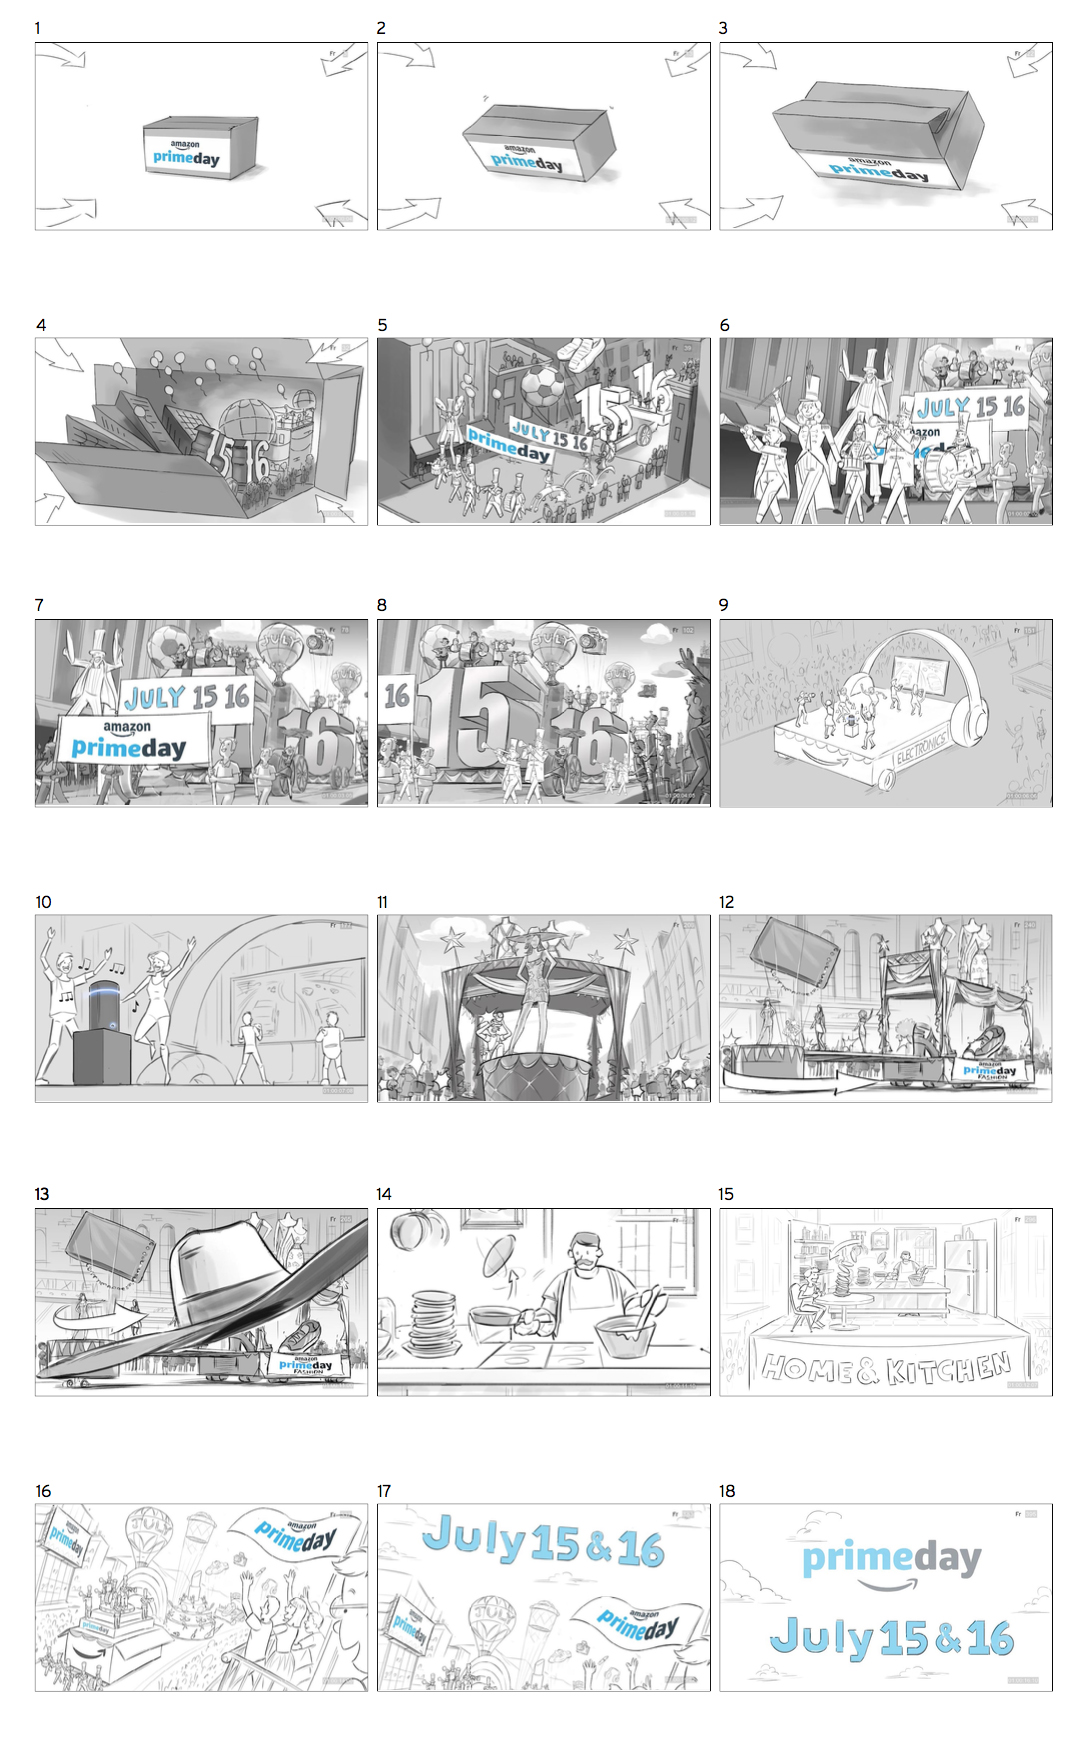 amazon casestudy storyboards petersluzska